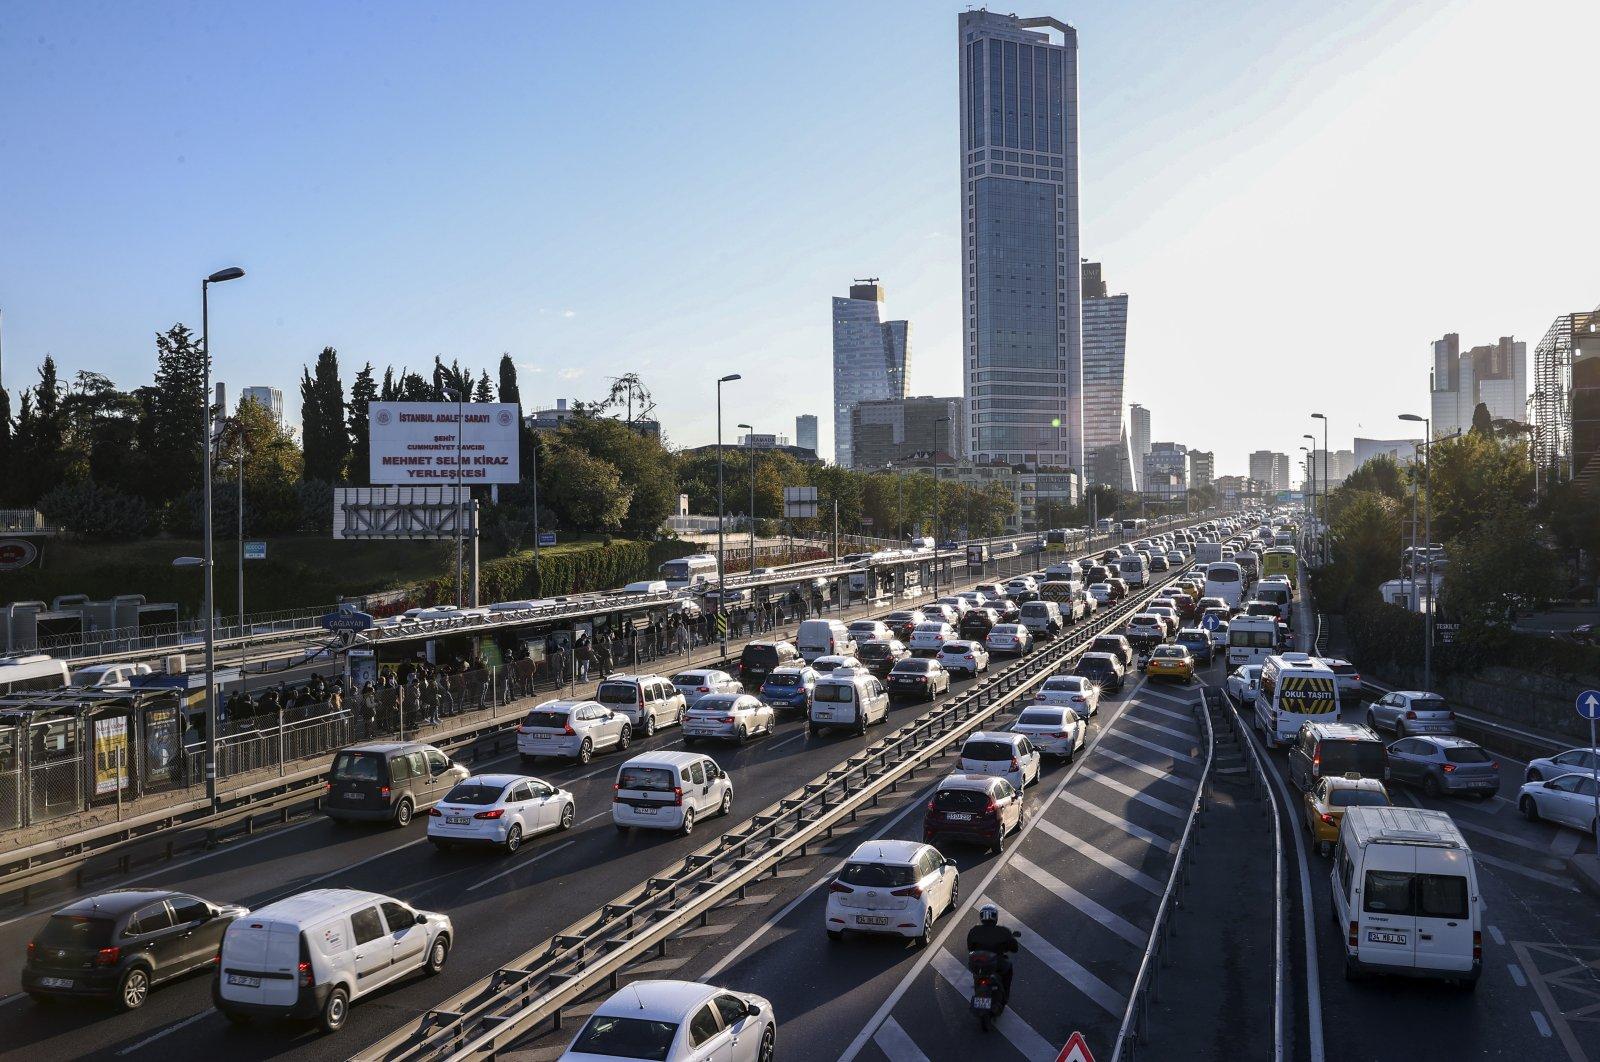 Vehicles in traffic in Çağlayan neighborhood, one of the busiest areas in Istanbul, Turkey, Oct. 4, 2021. (AA PHOTO)